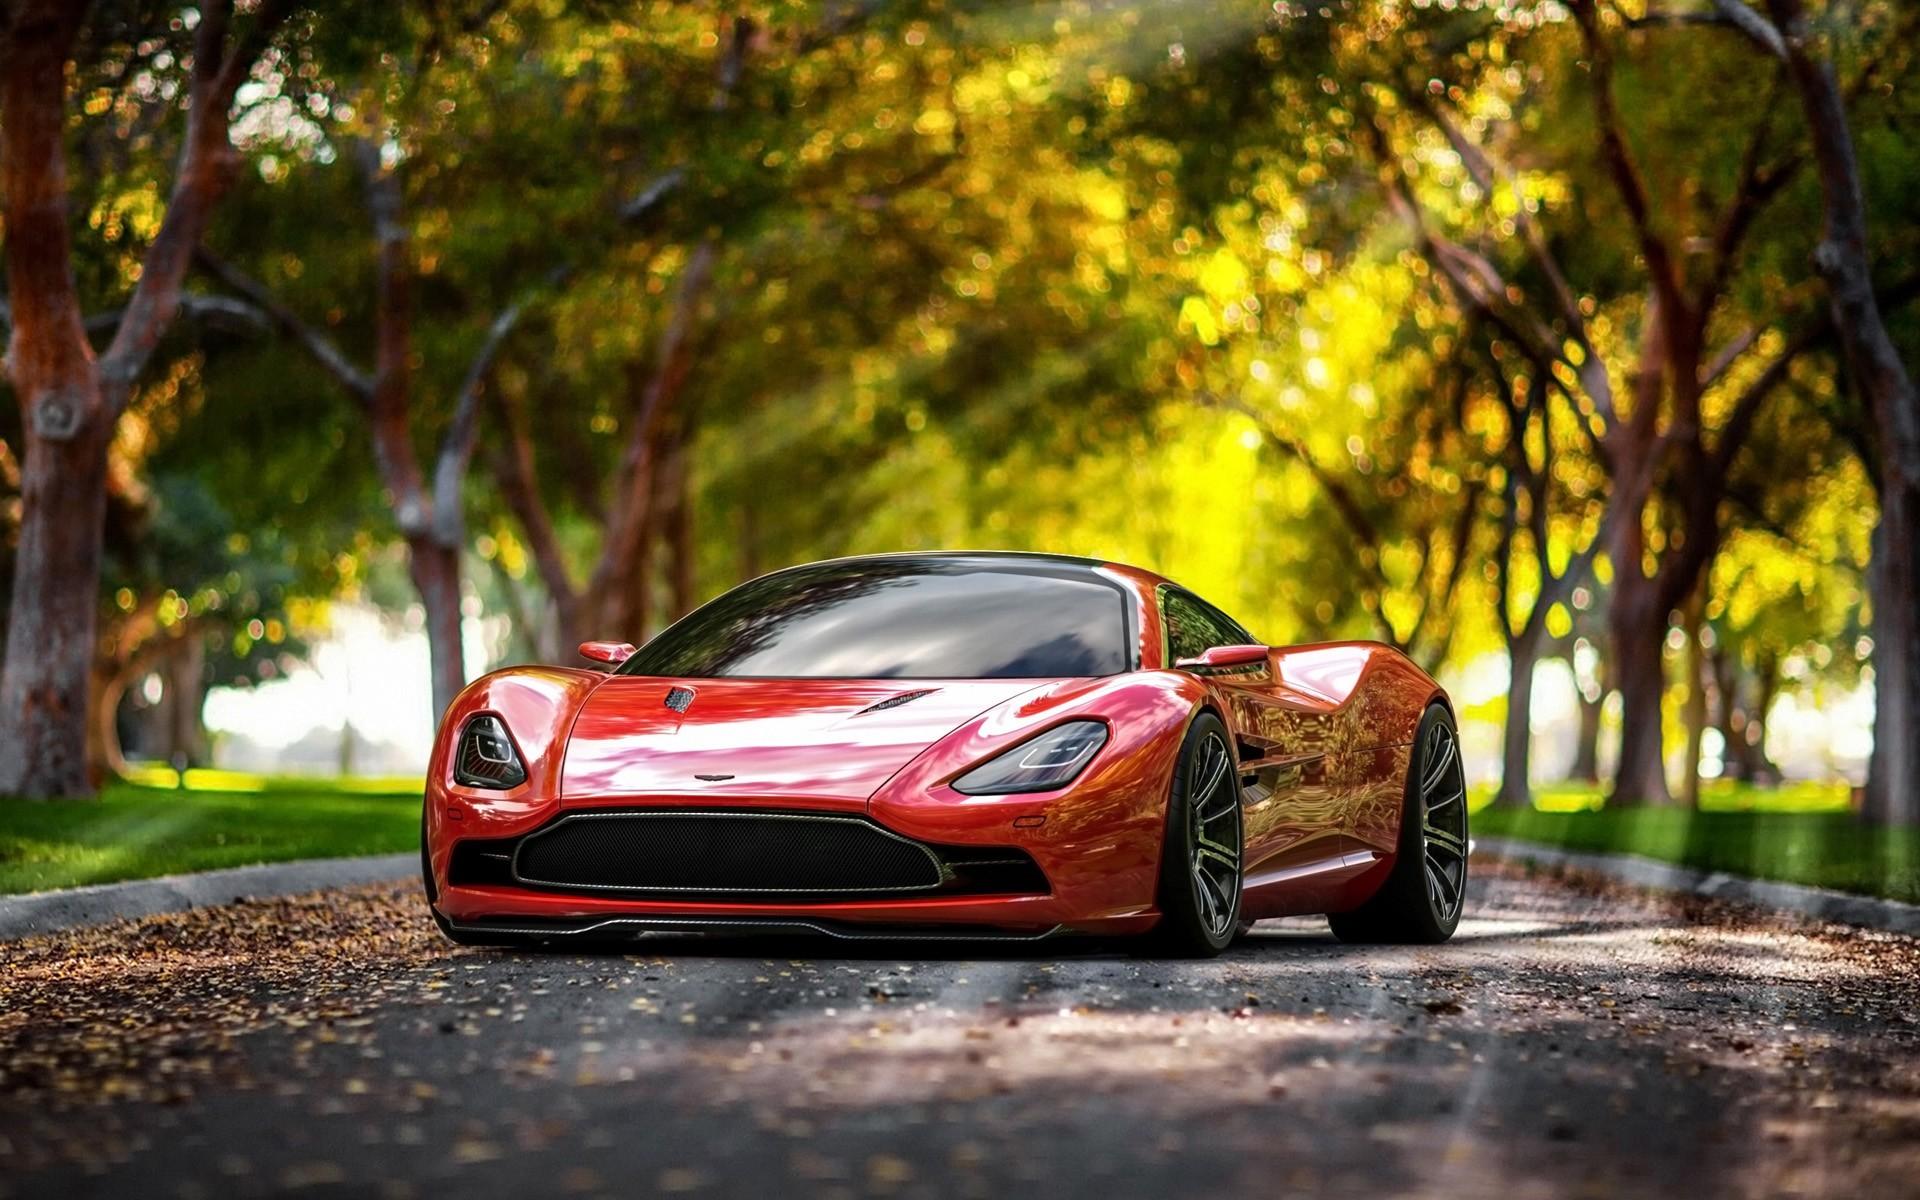 Sunlight Car Concept Cars Vehicle Red Cars Bokeh Sports Car Aston Martin  Performance Car Aston Martin